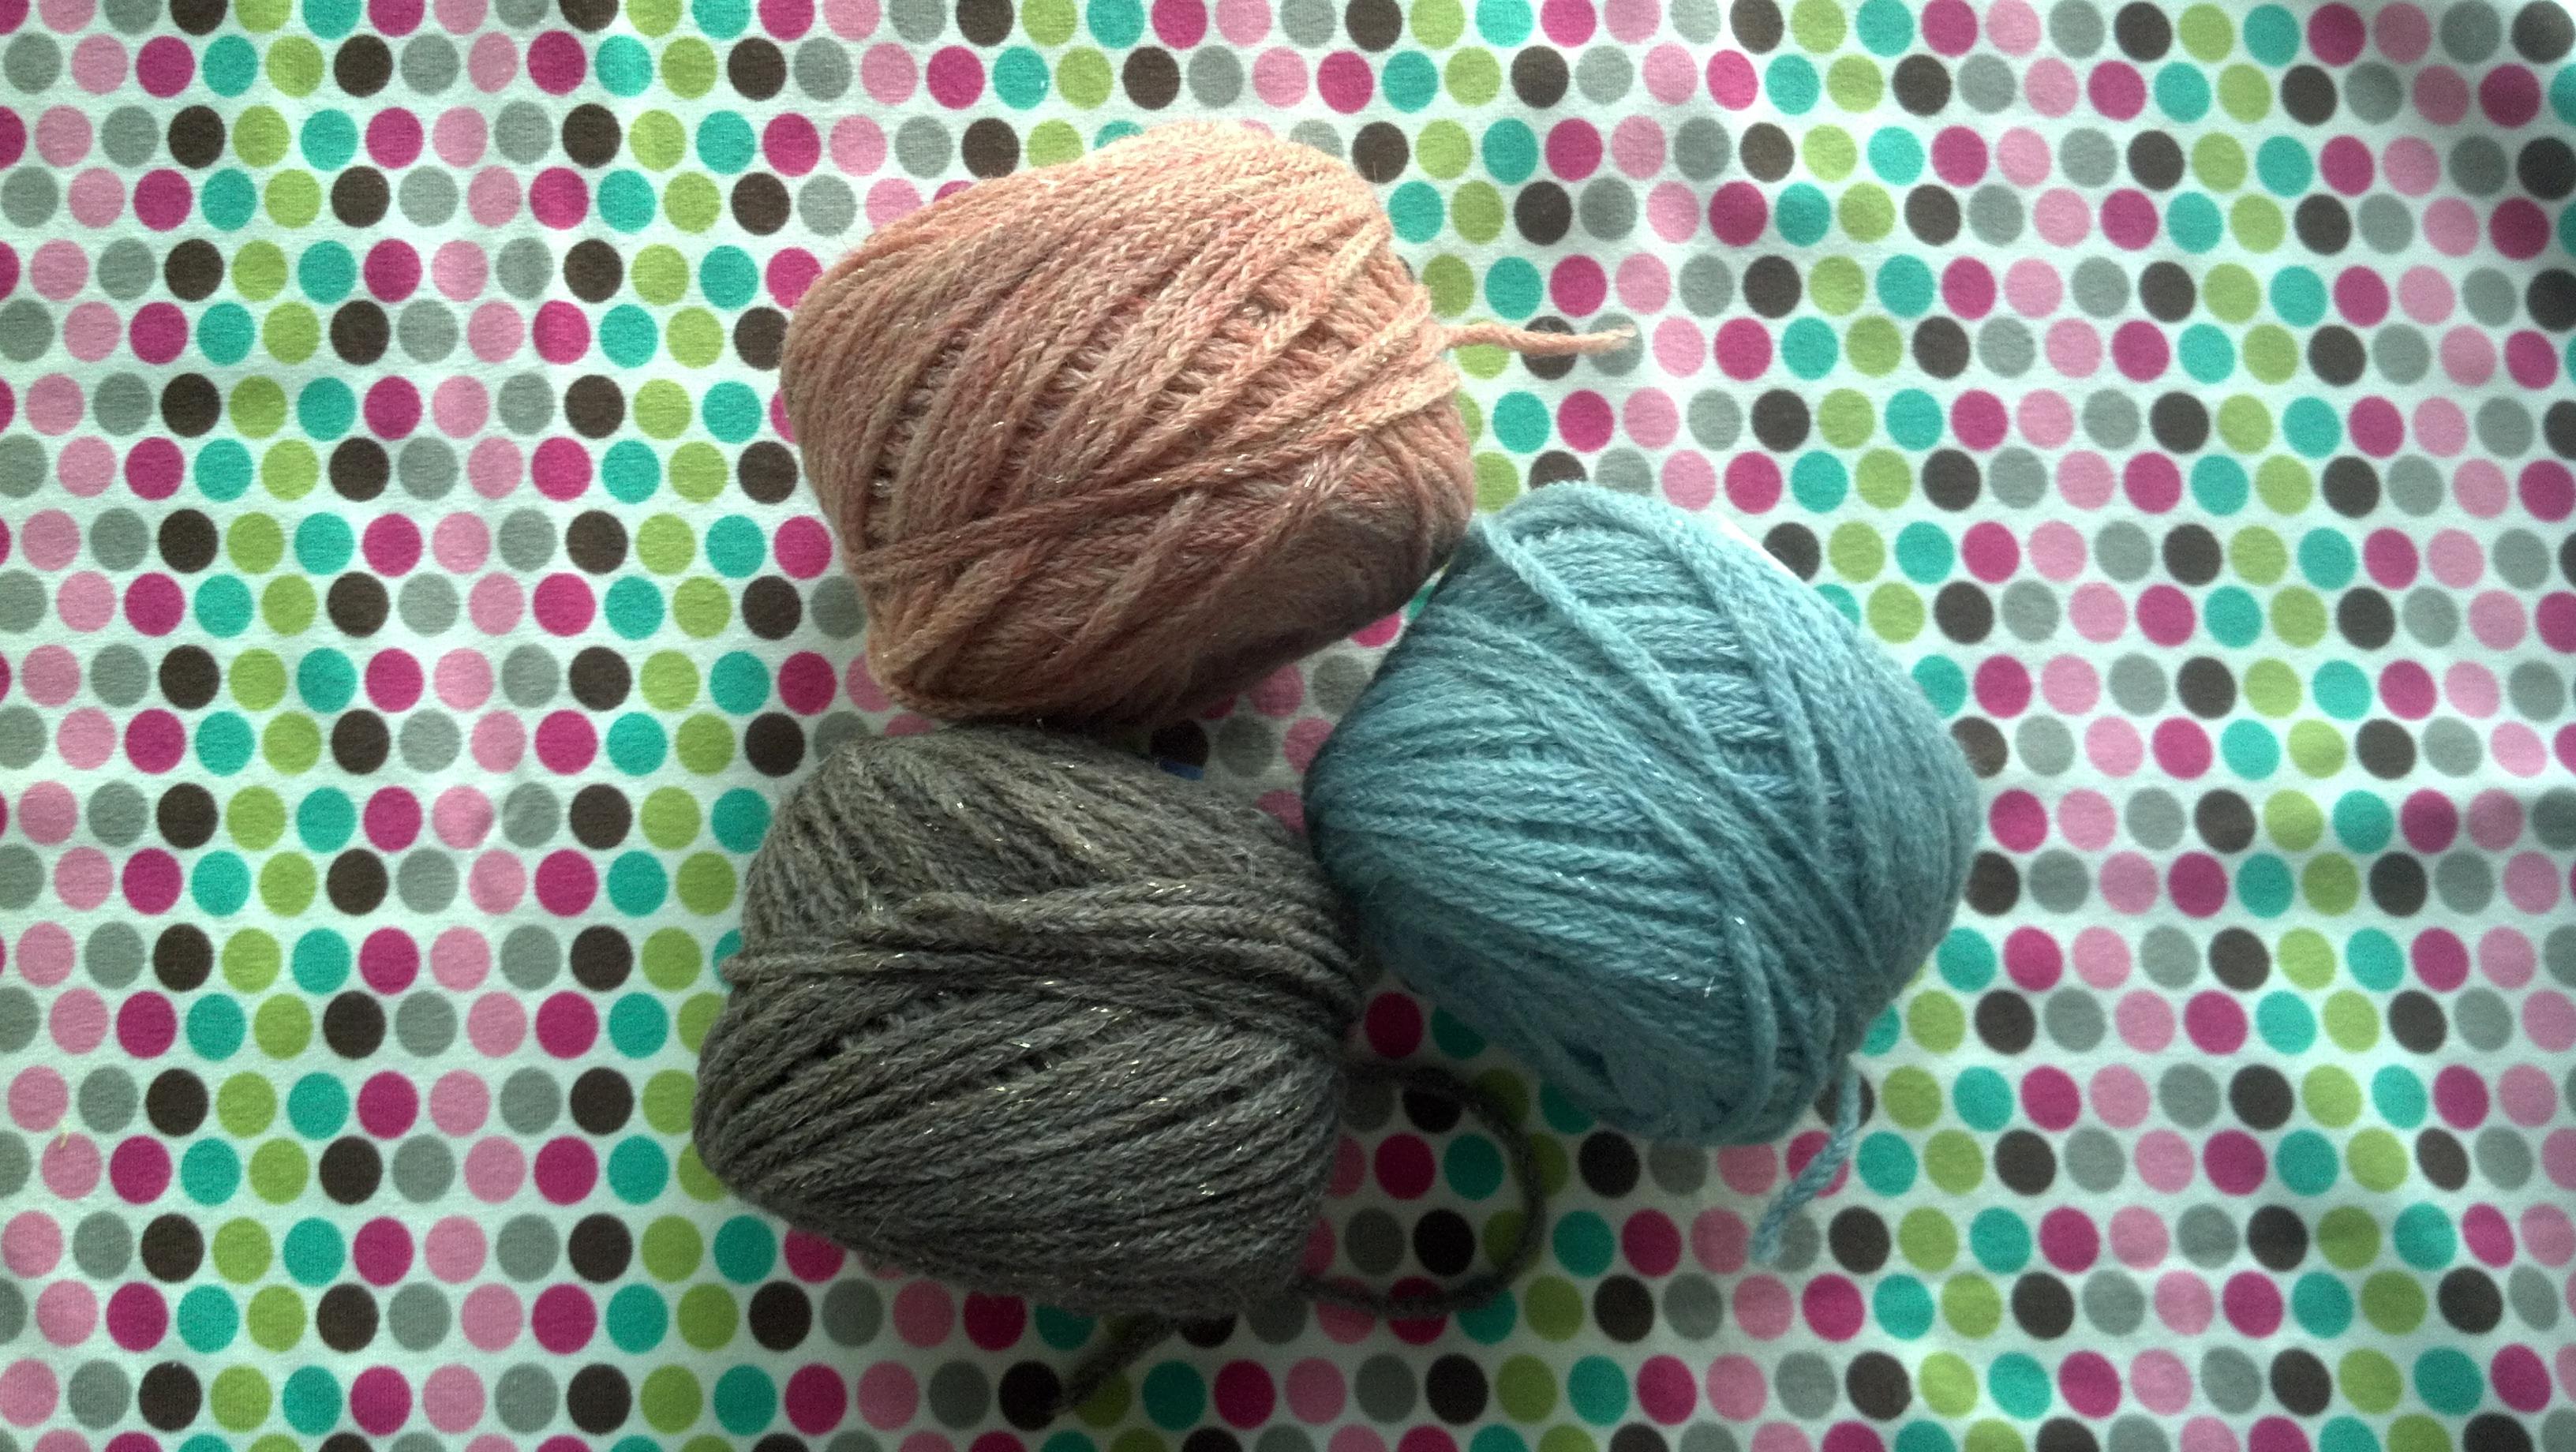 Berroco-Flicker-yarn   tolmema